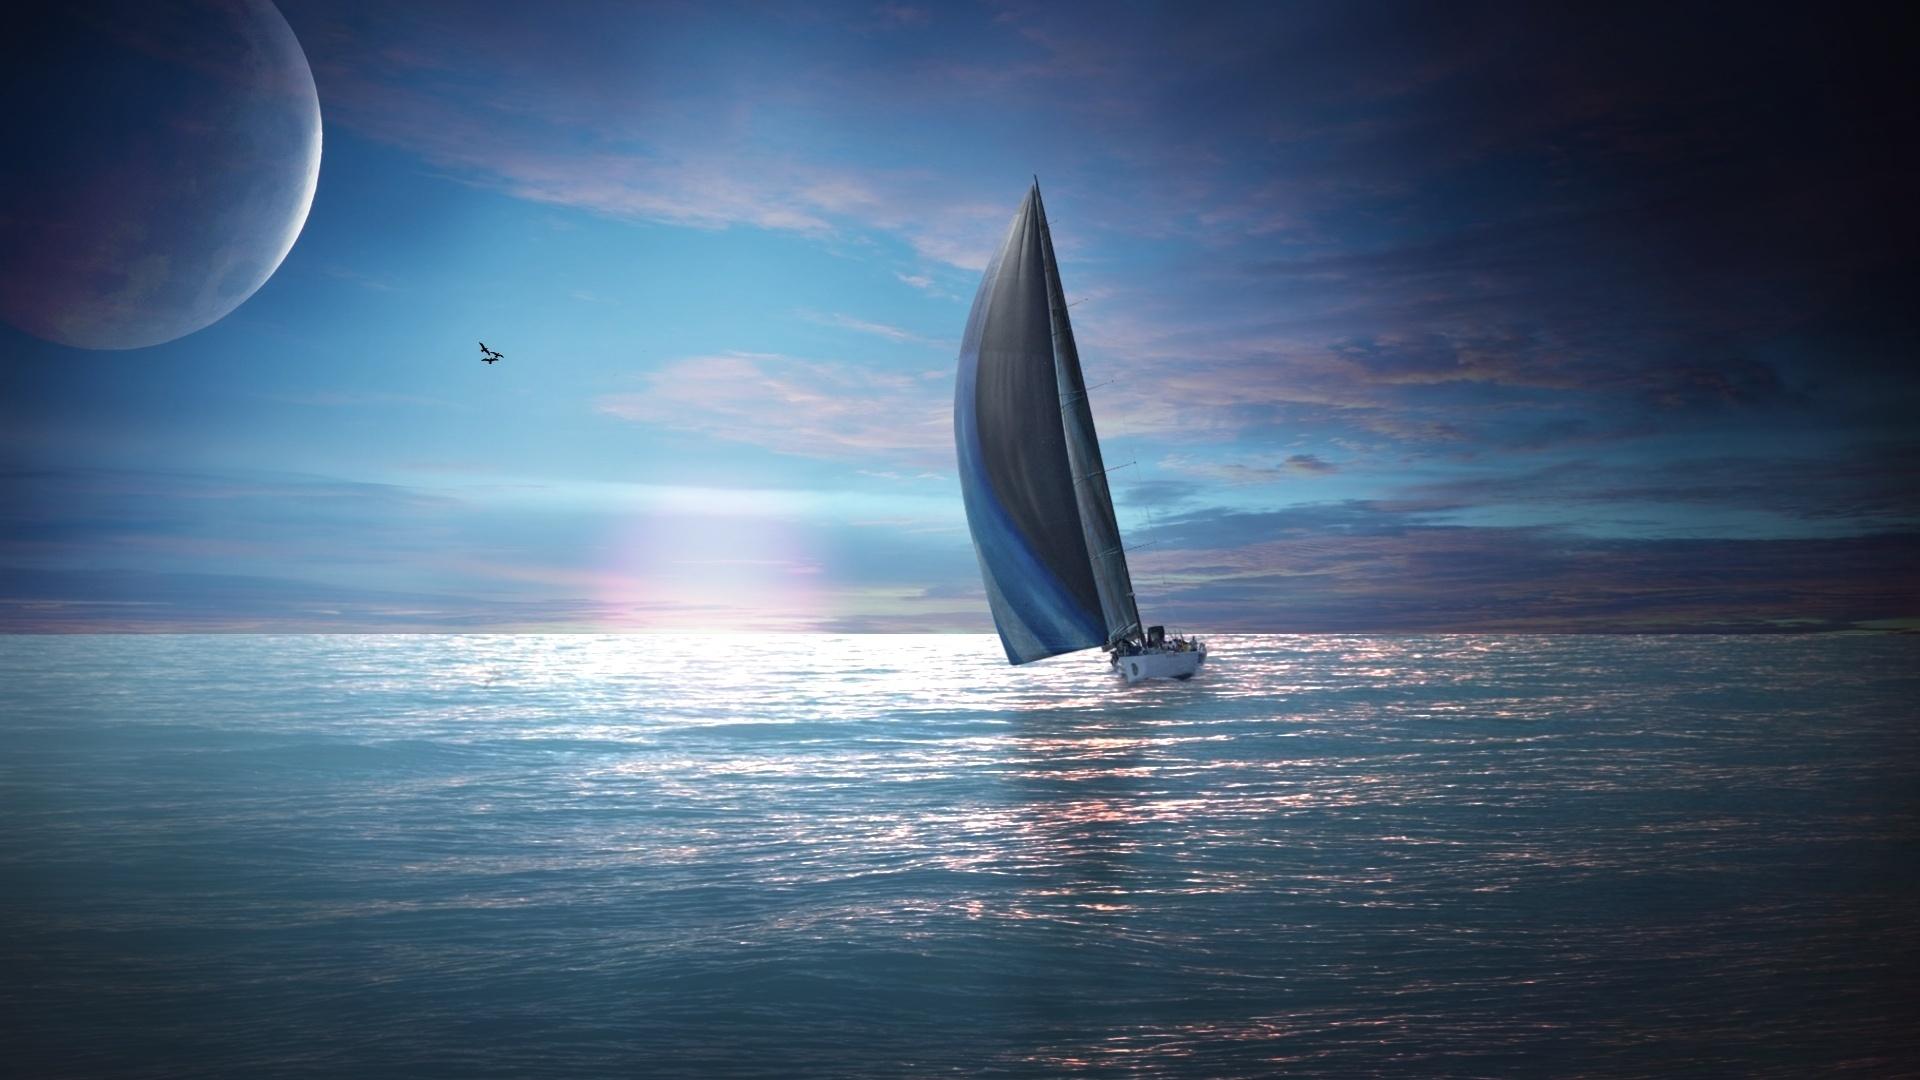 корабль паруса небо море анонимно